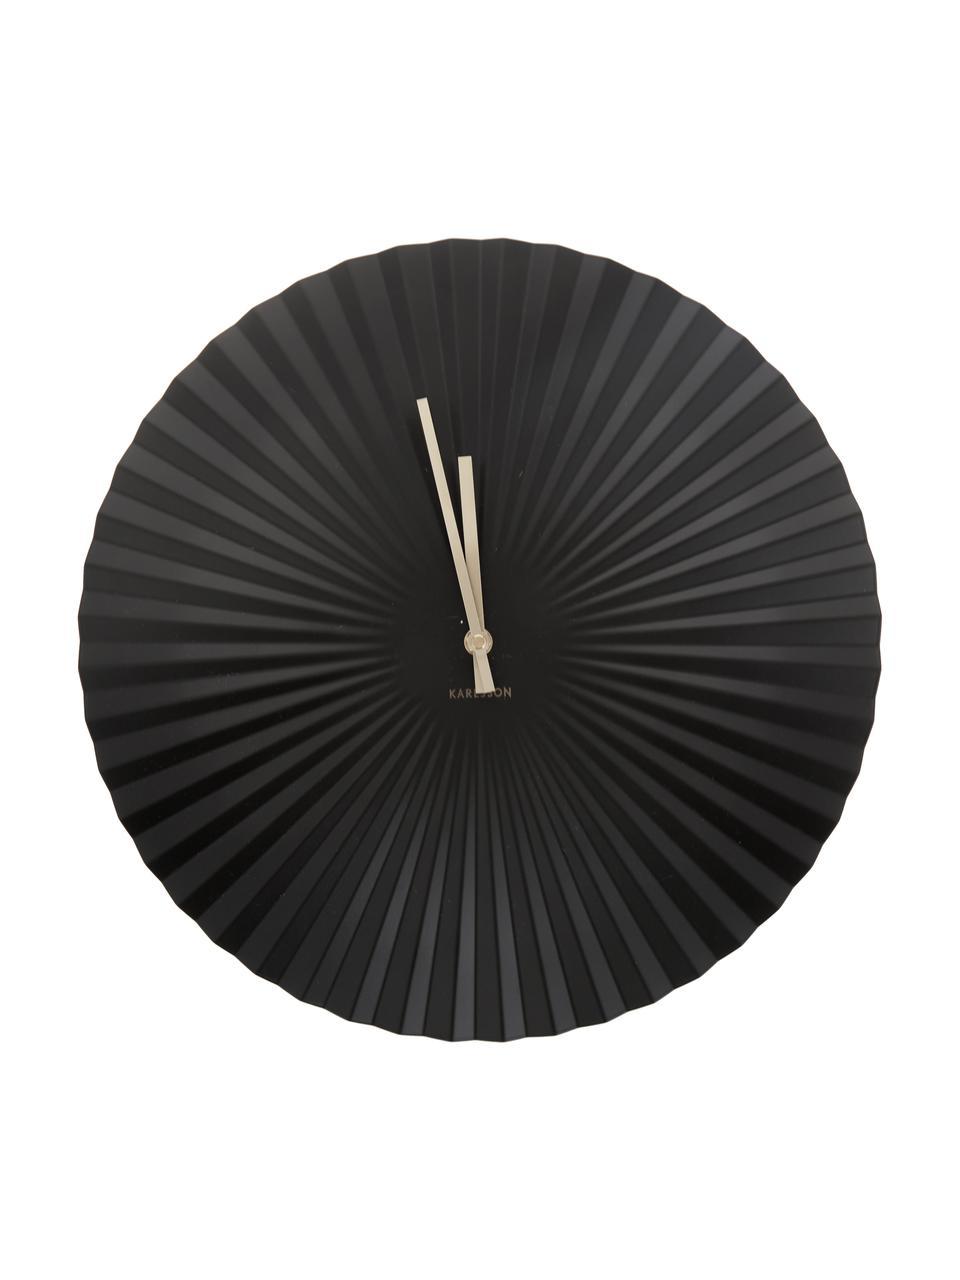 Zegar ścienny Sensu, Czarny, Ø 40 cm